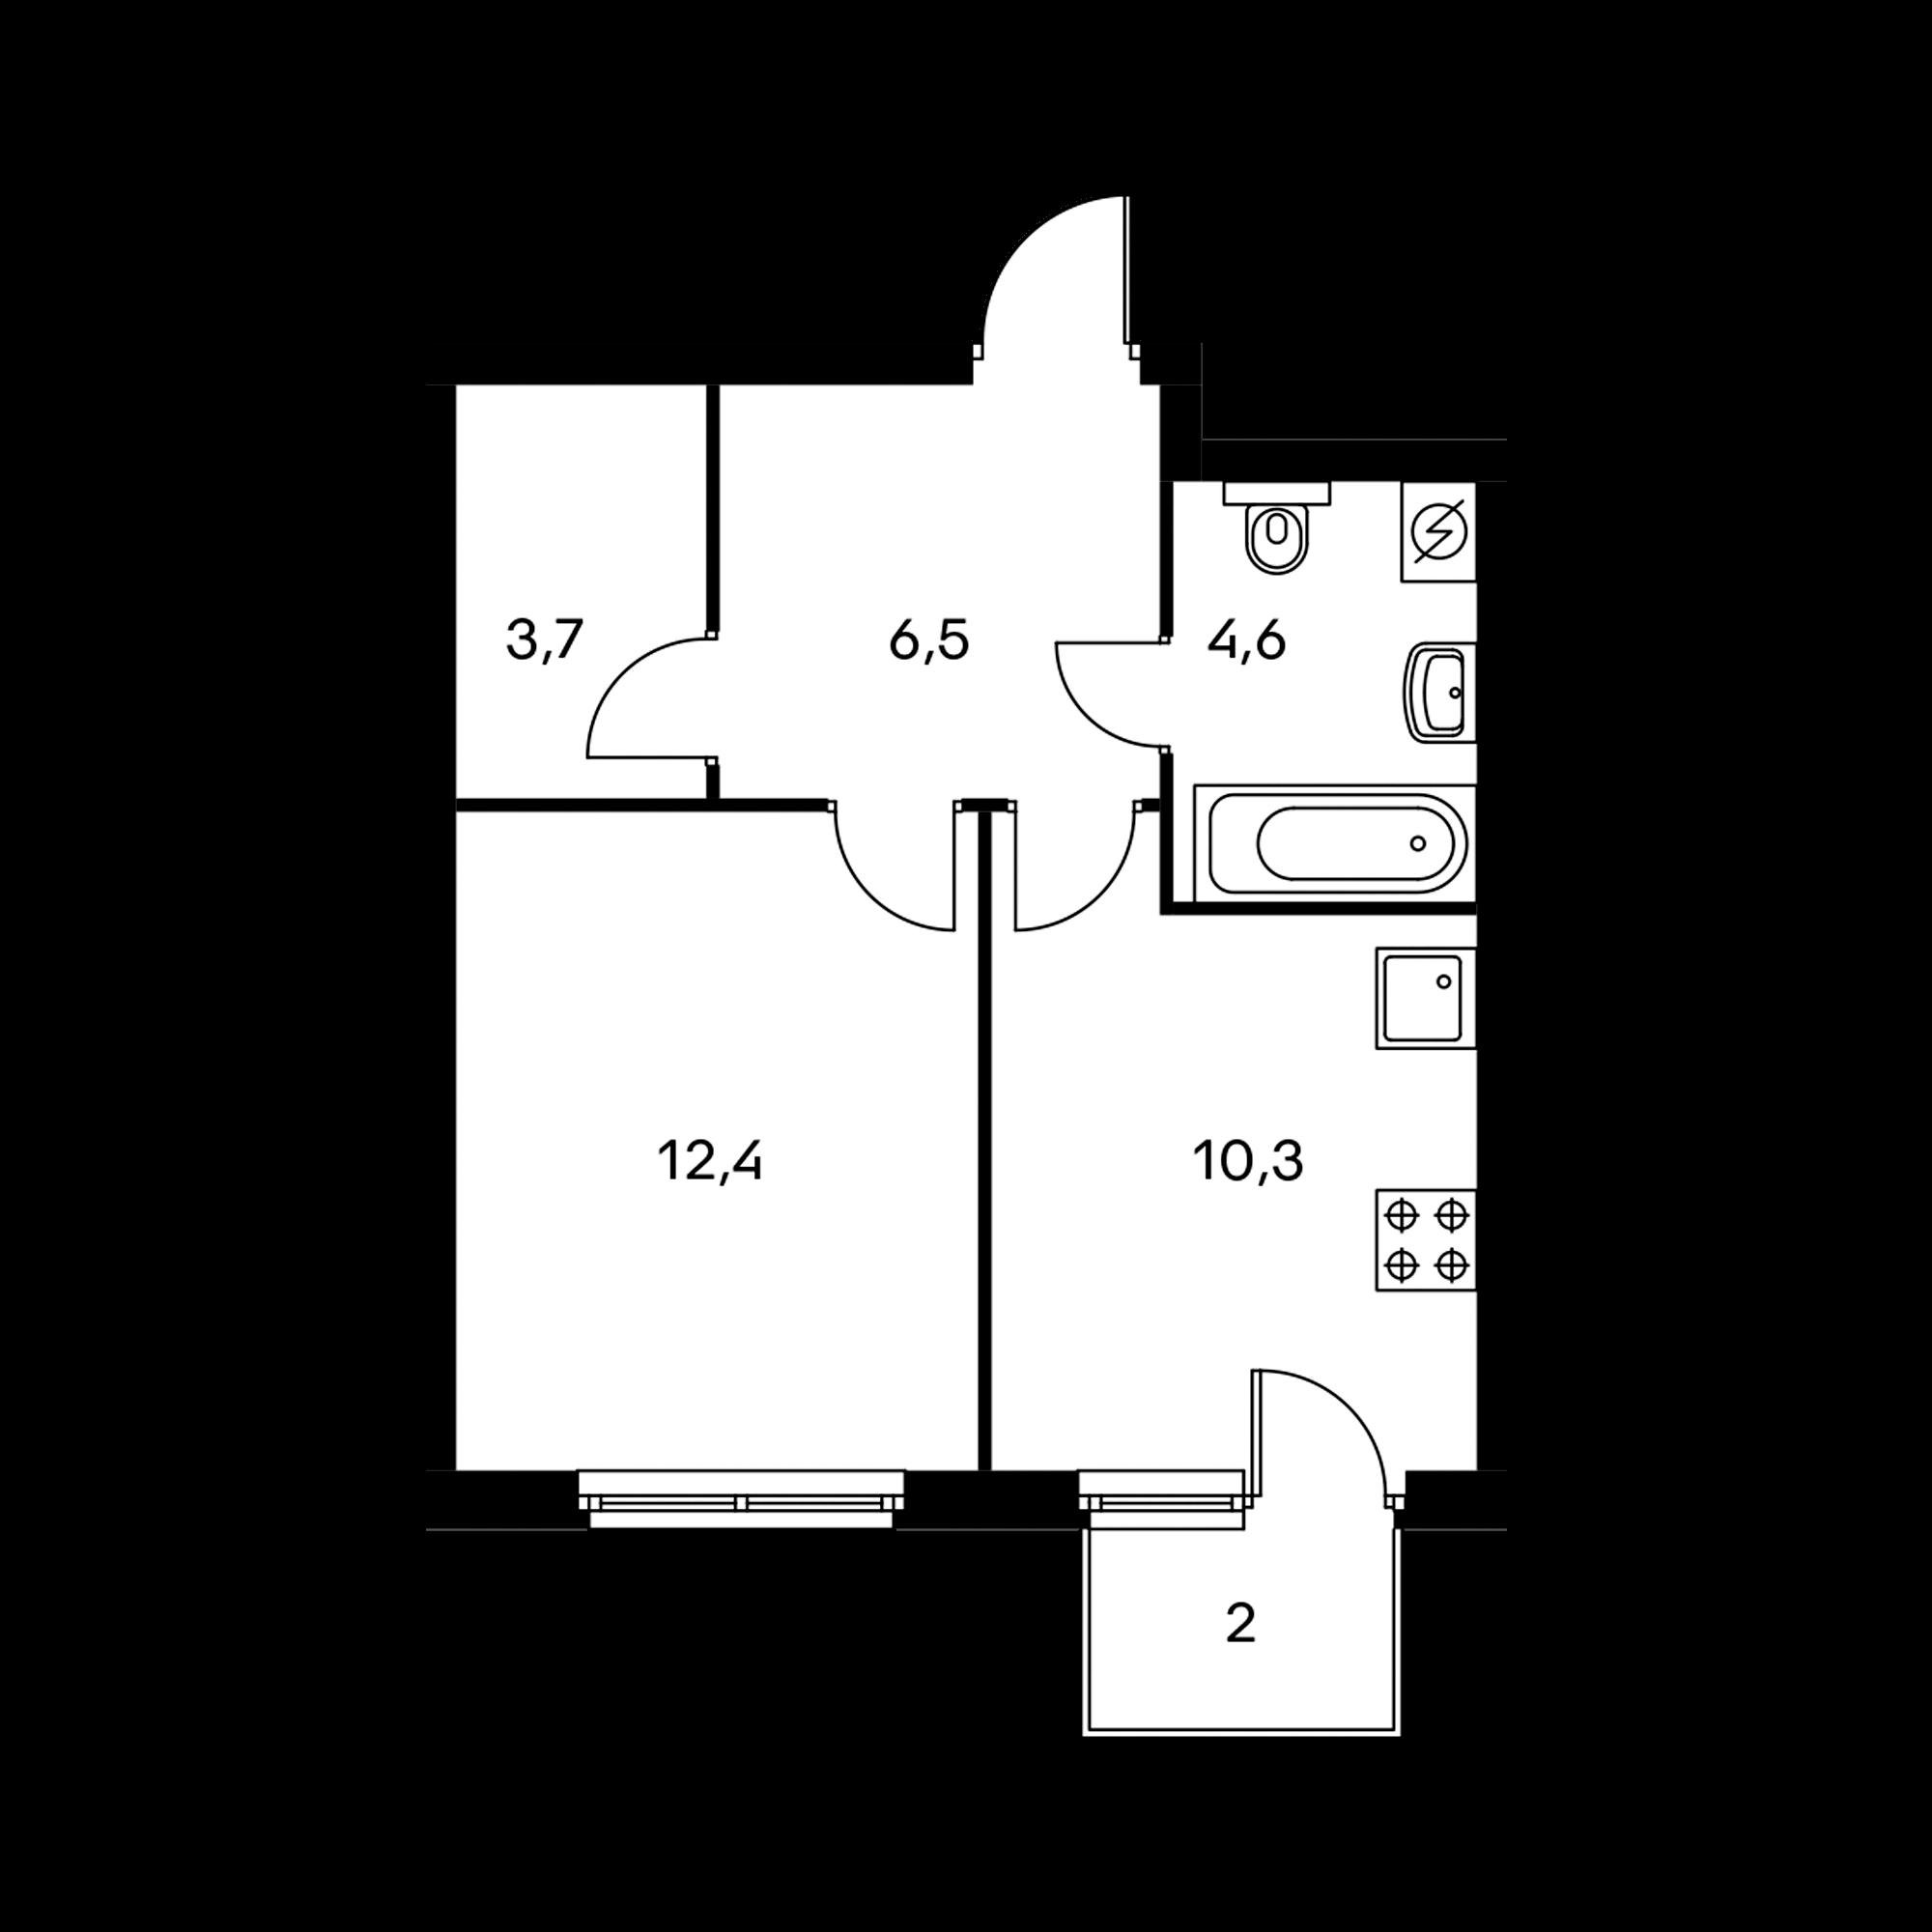 1KM1_6.3-1B